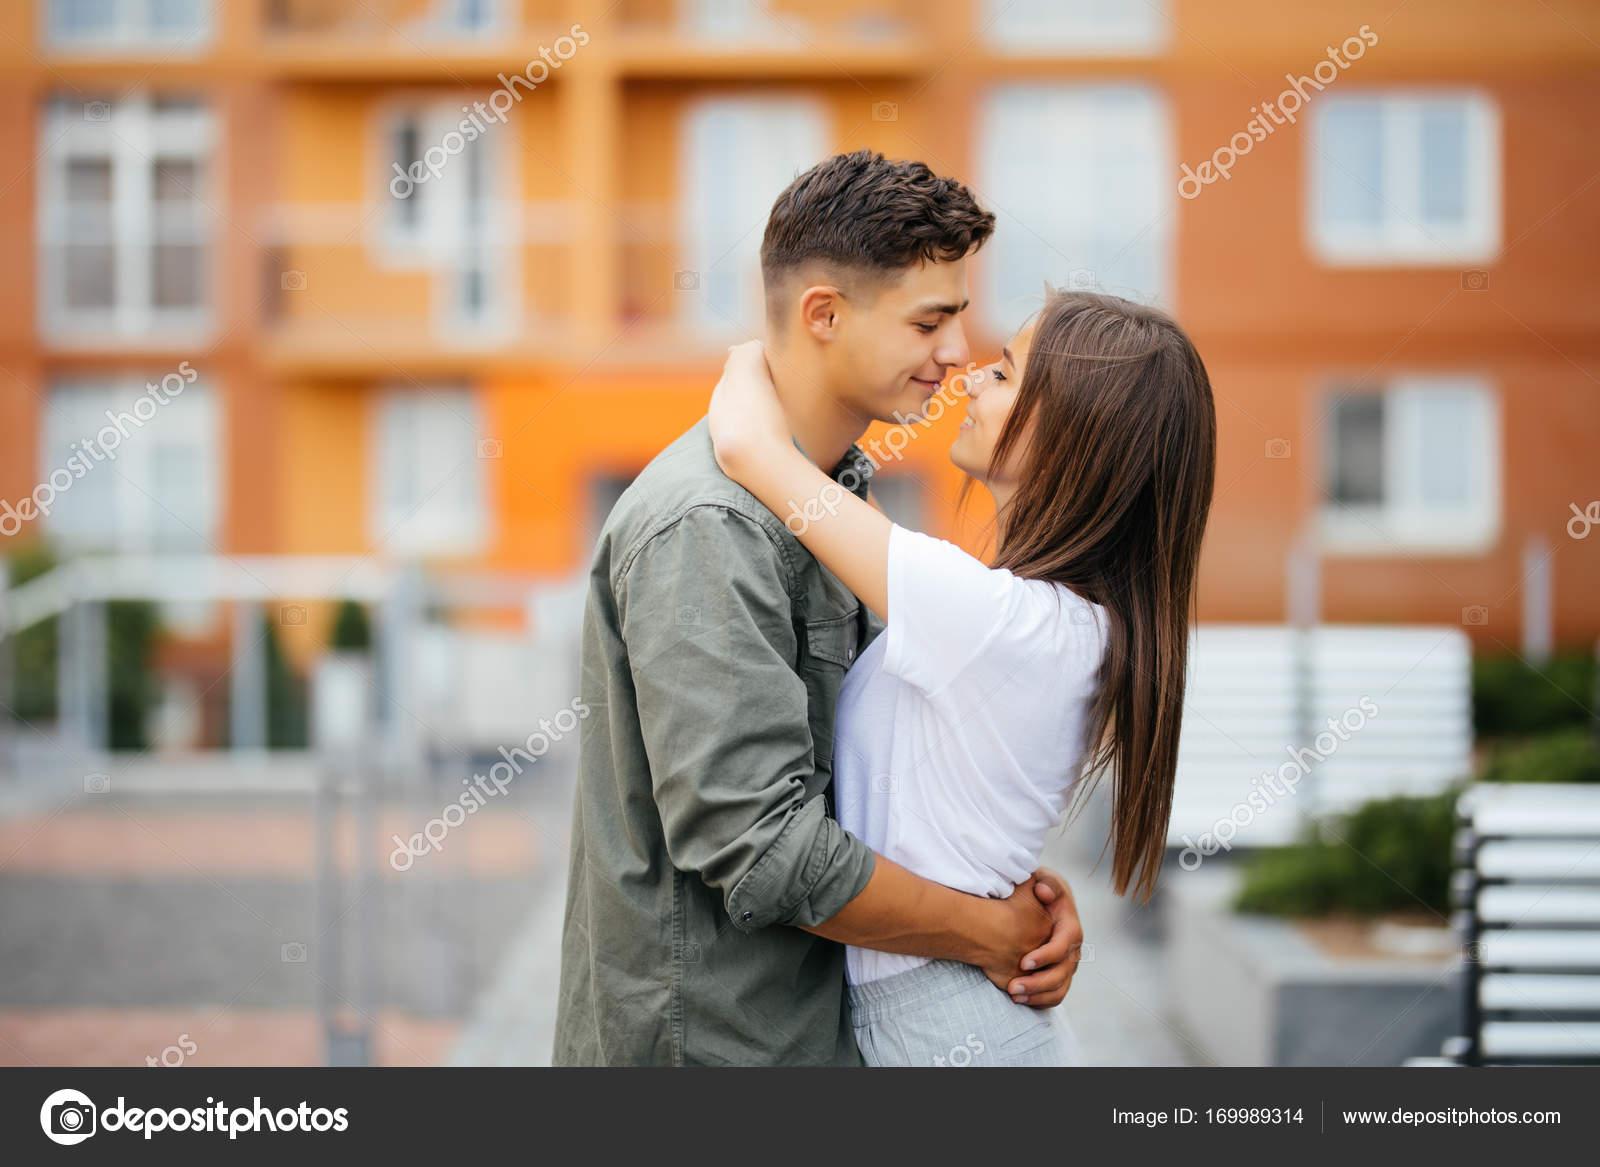 Dejting kyssar